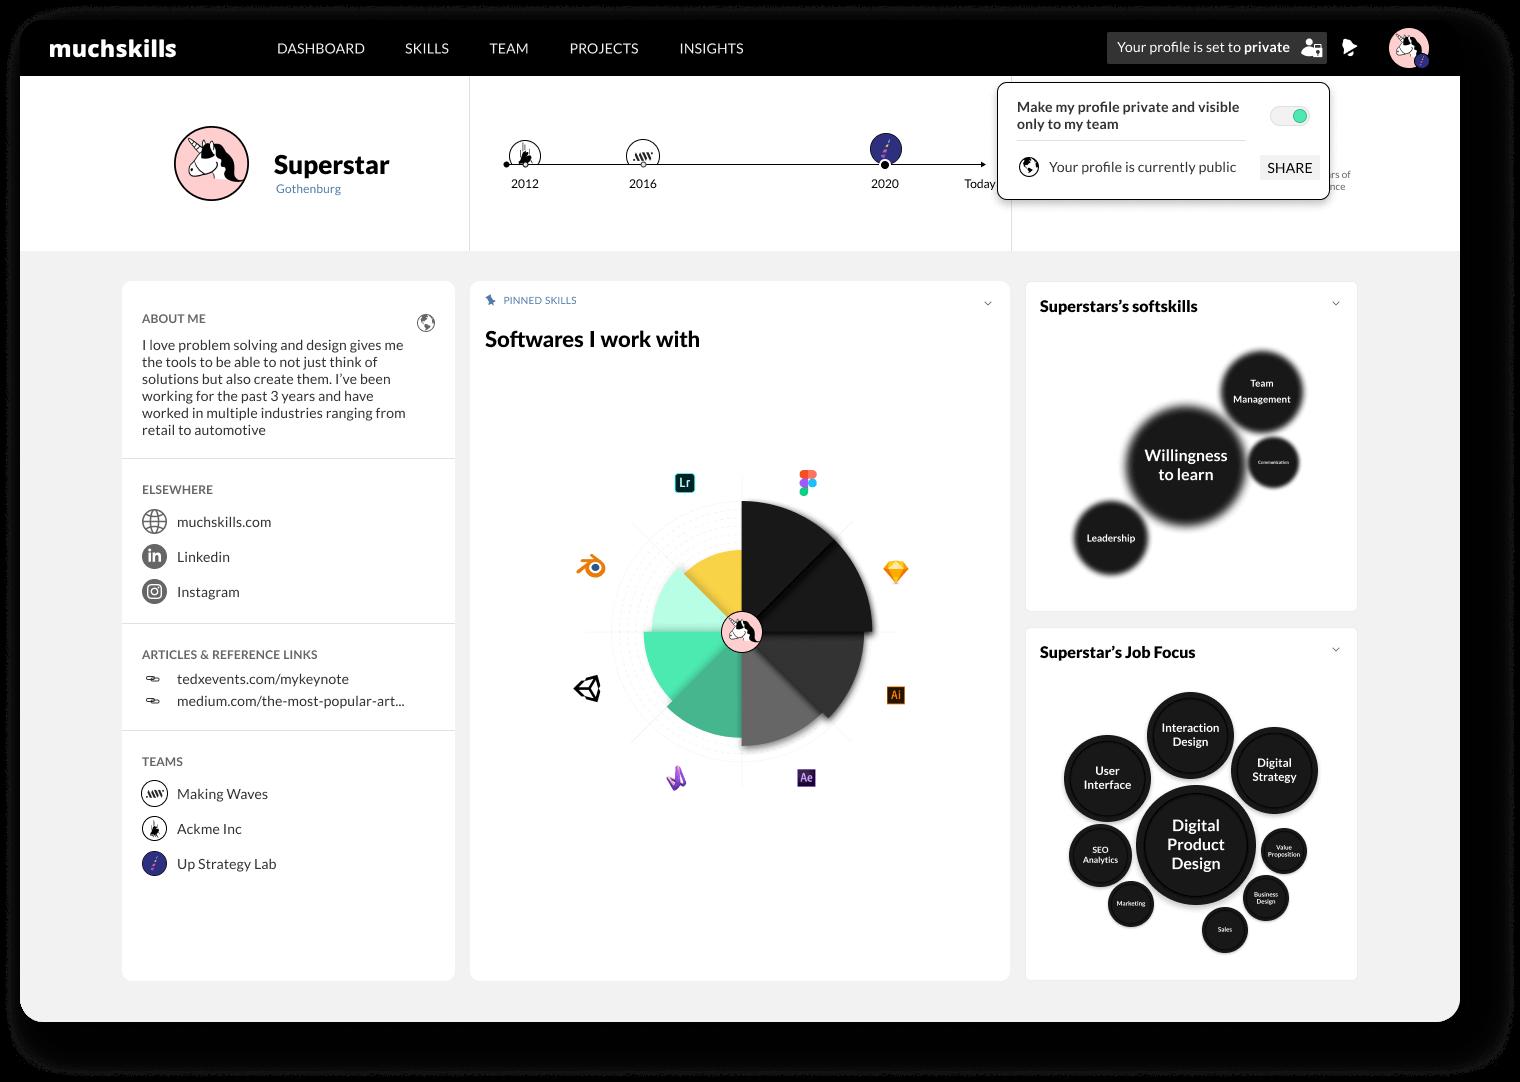 MuchSkills Profile view